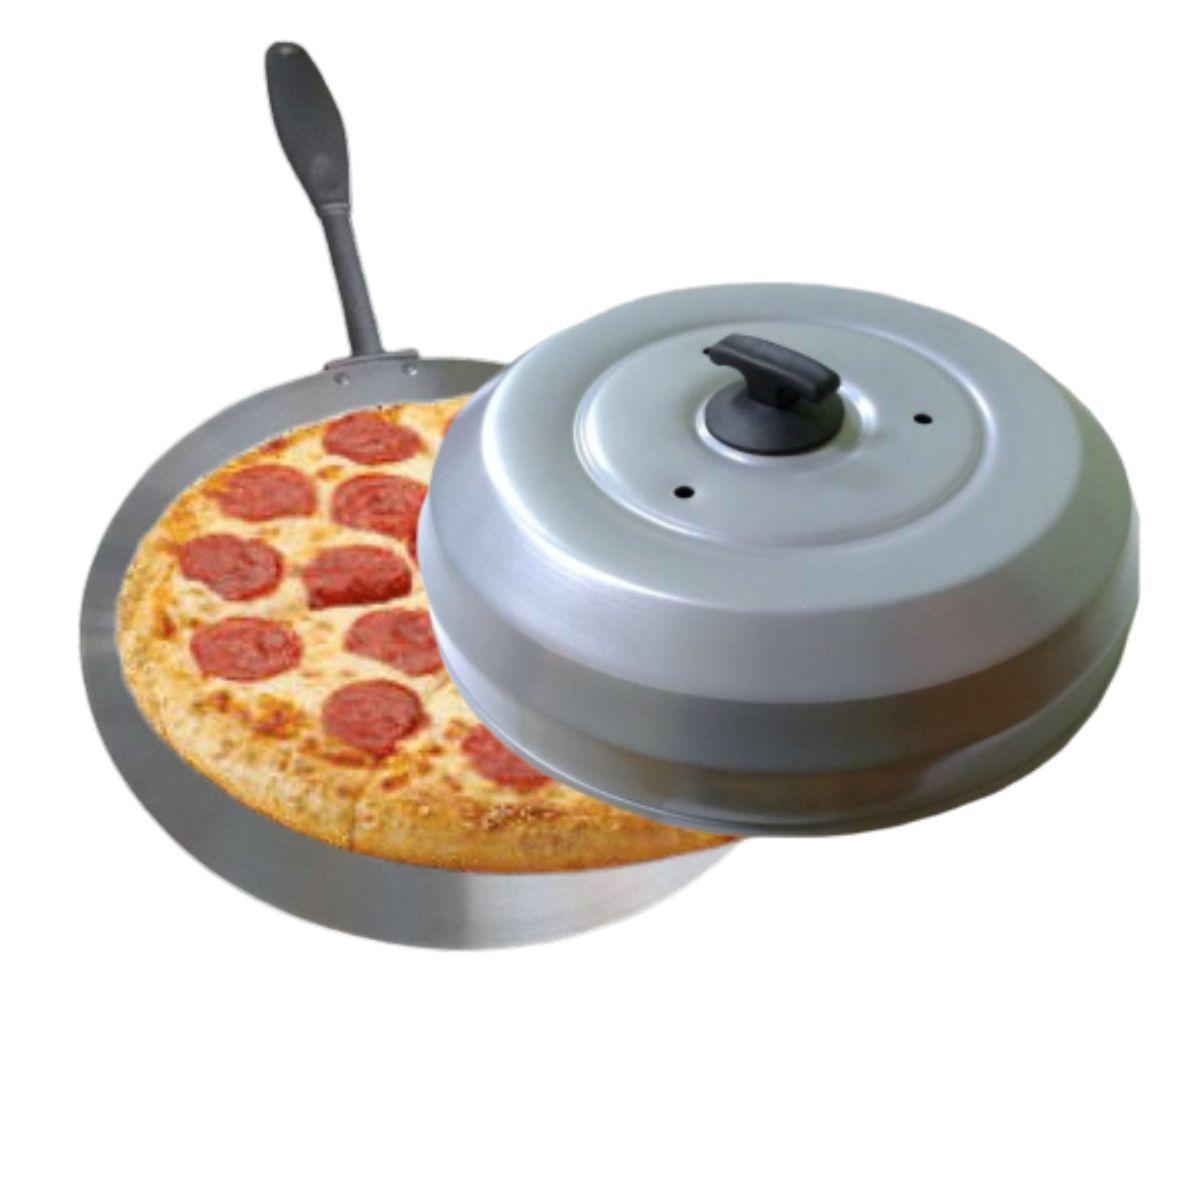 Kit Pizzaria Abafador De Pizza Cinza Grande 40cm Com Pá Para Pizza Cabo longo Reforçado 27cm - Gallizzi